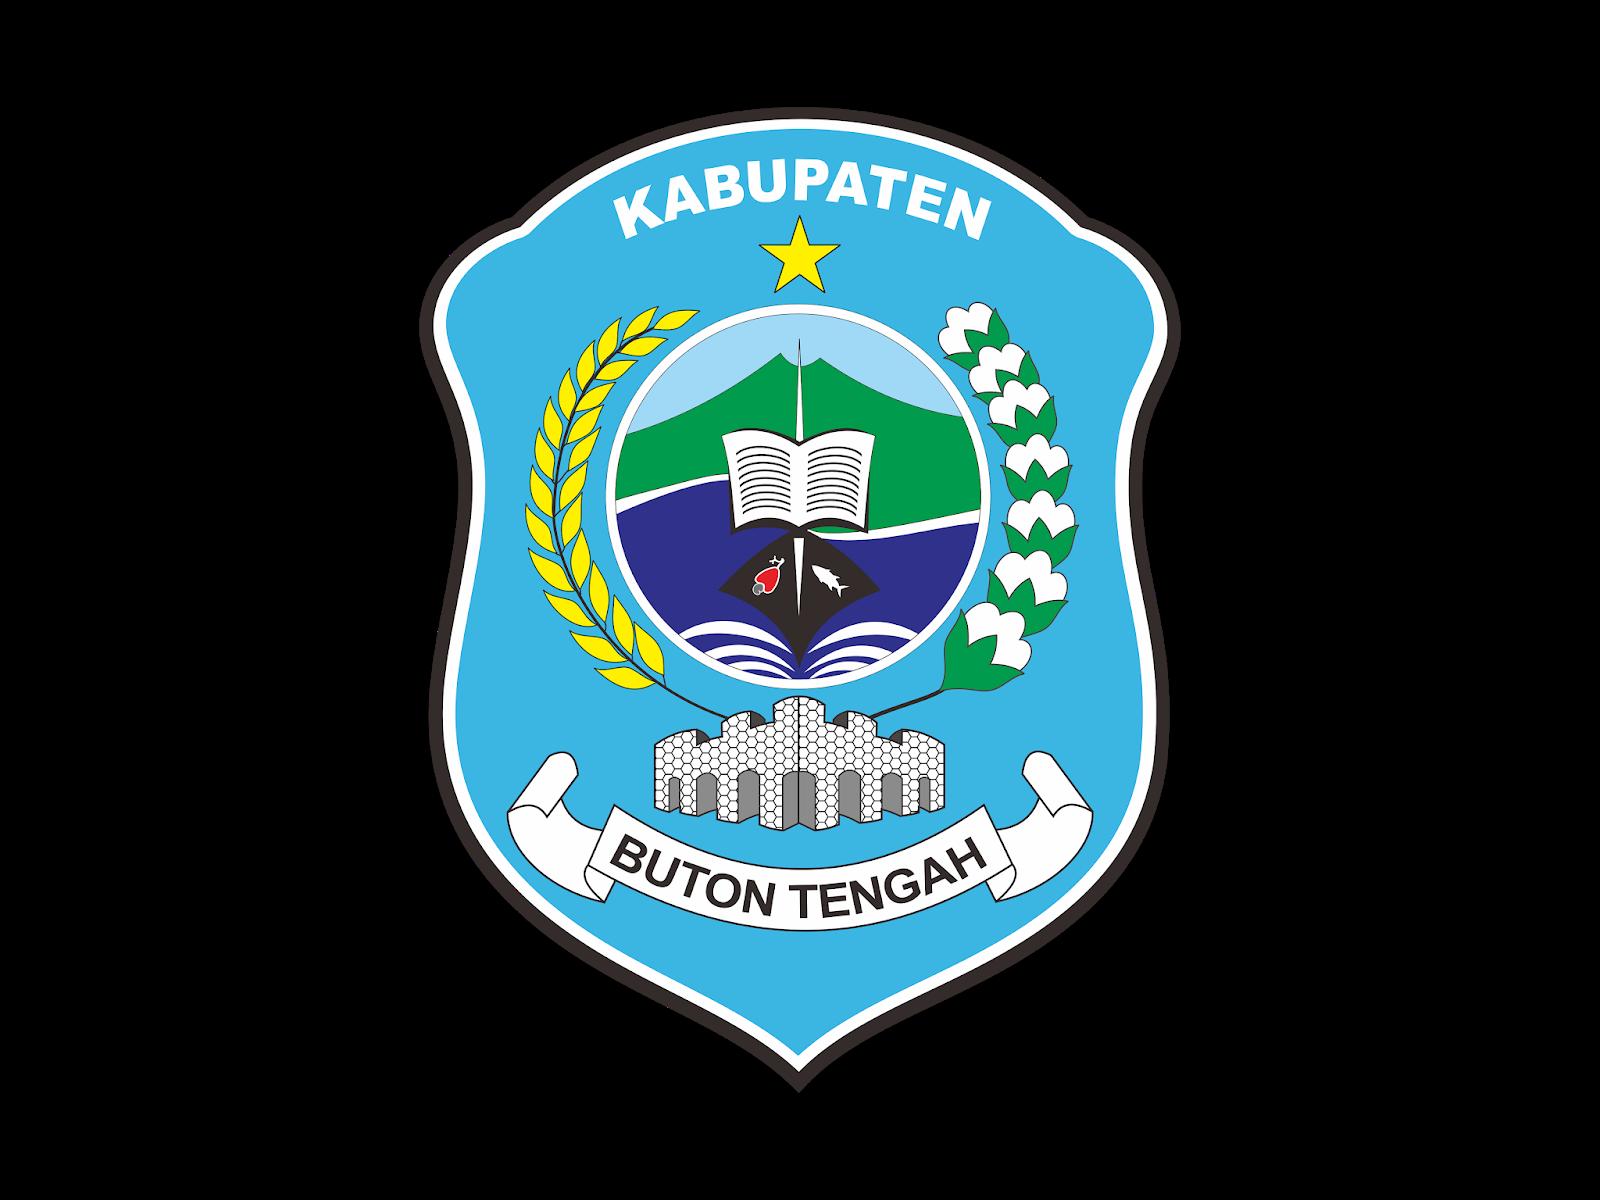 Logo Kabupaten Buton Tengah Vector Format Cdr Png Svg Ai Biologizone